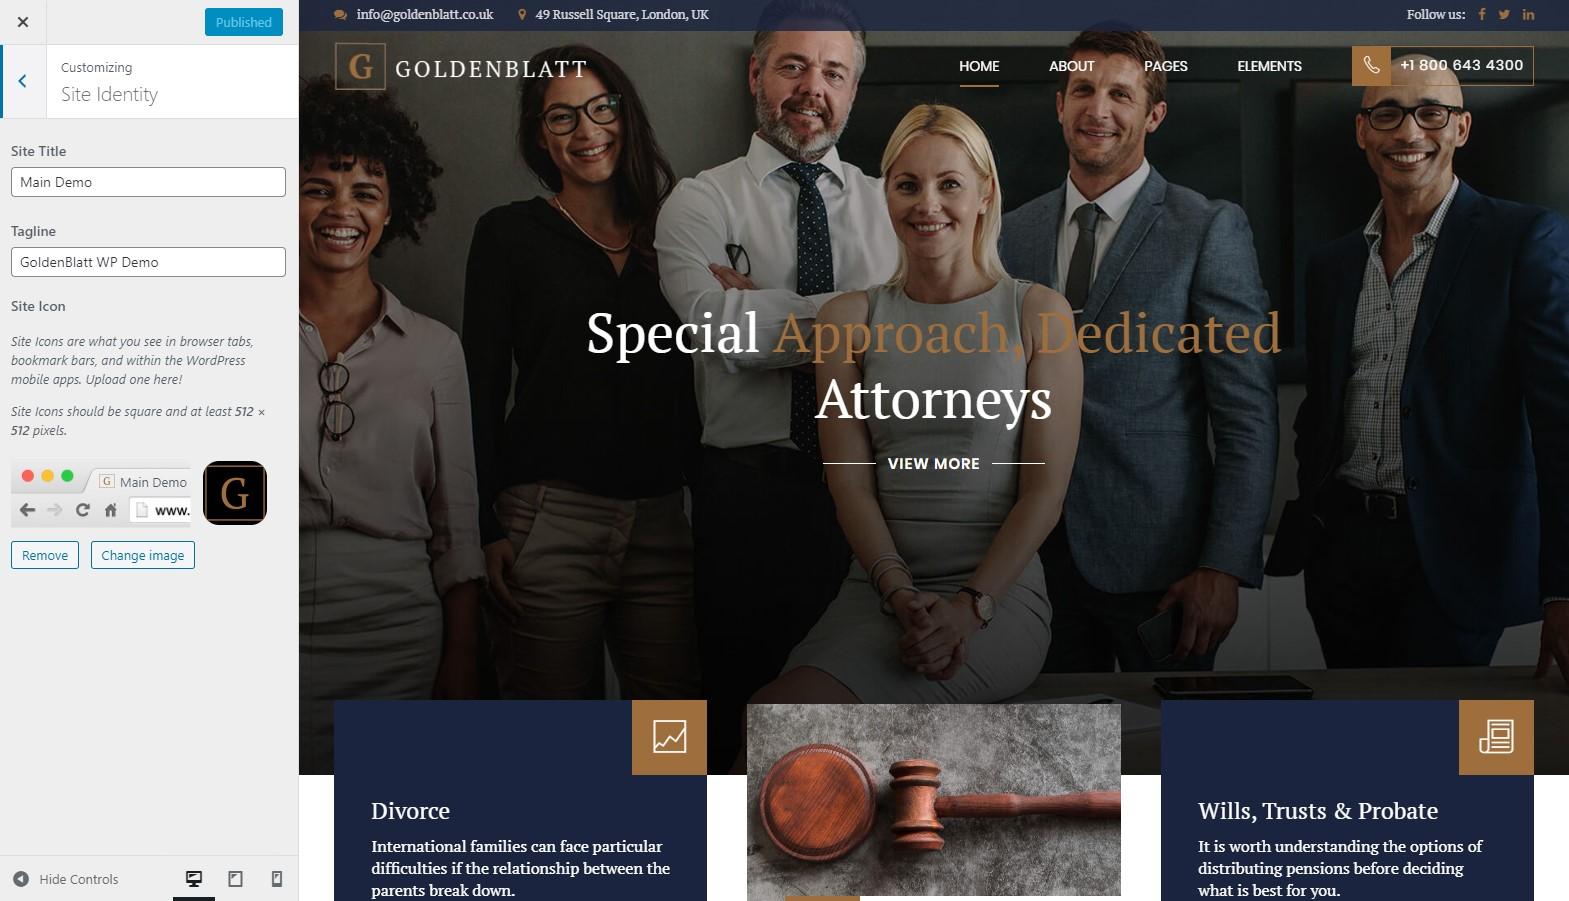 https://documentation.bold-themes.com/goldenblatt/wp-content/uploads/sites/51/2019/11/site-identity.jpg